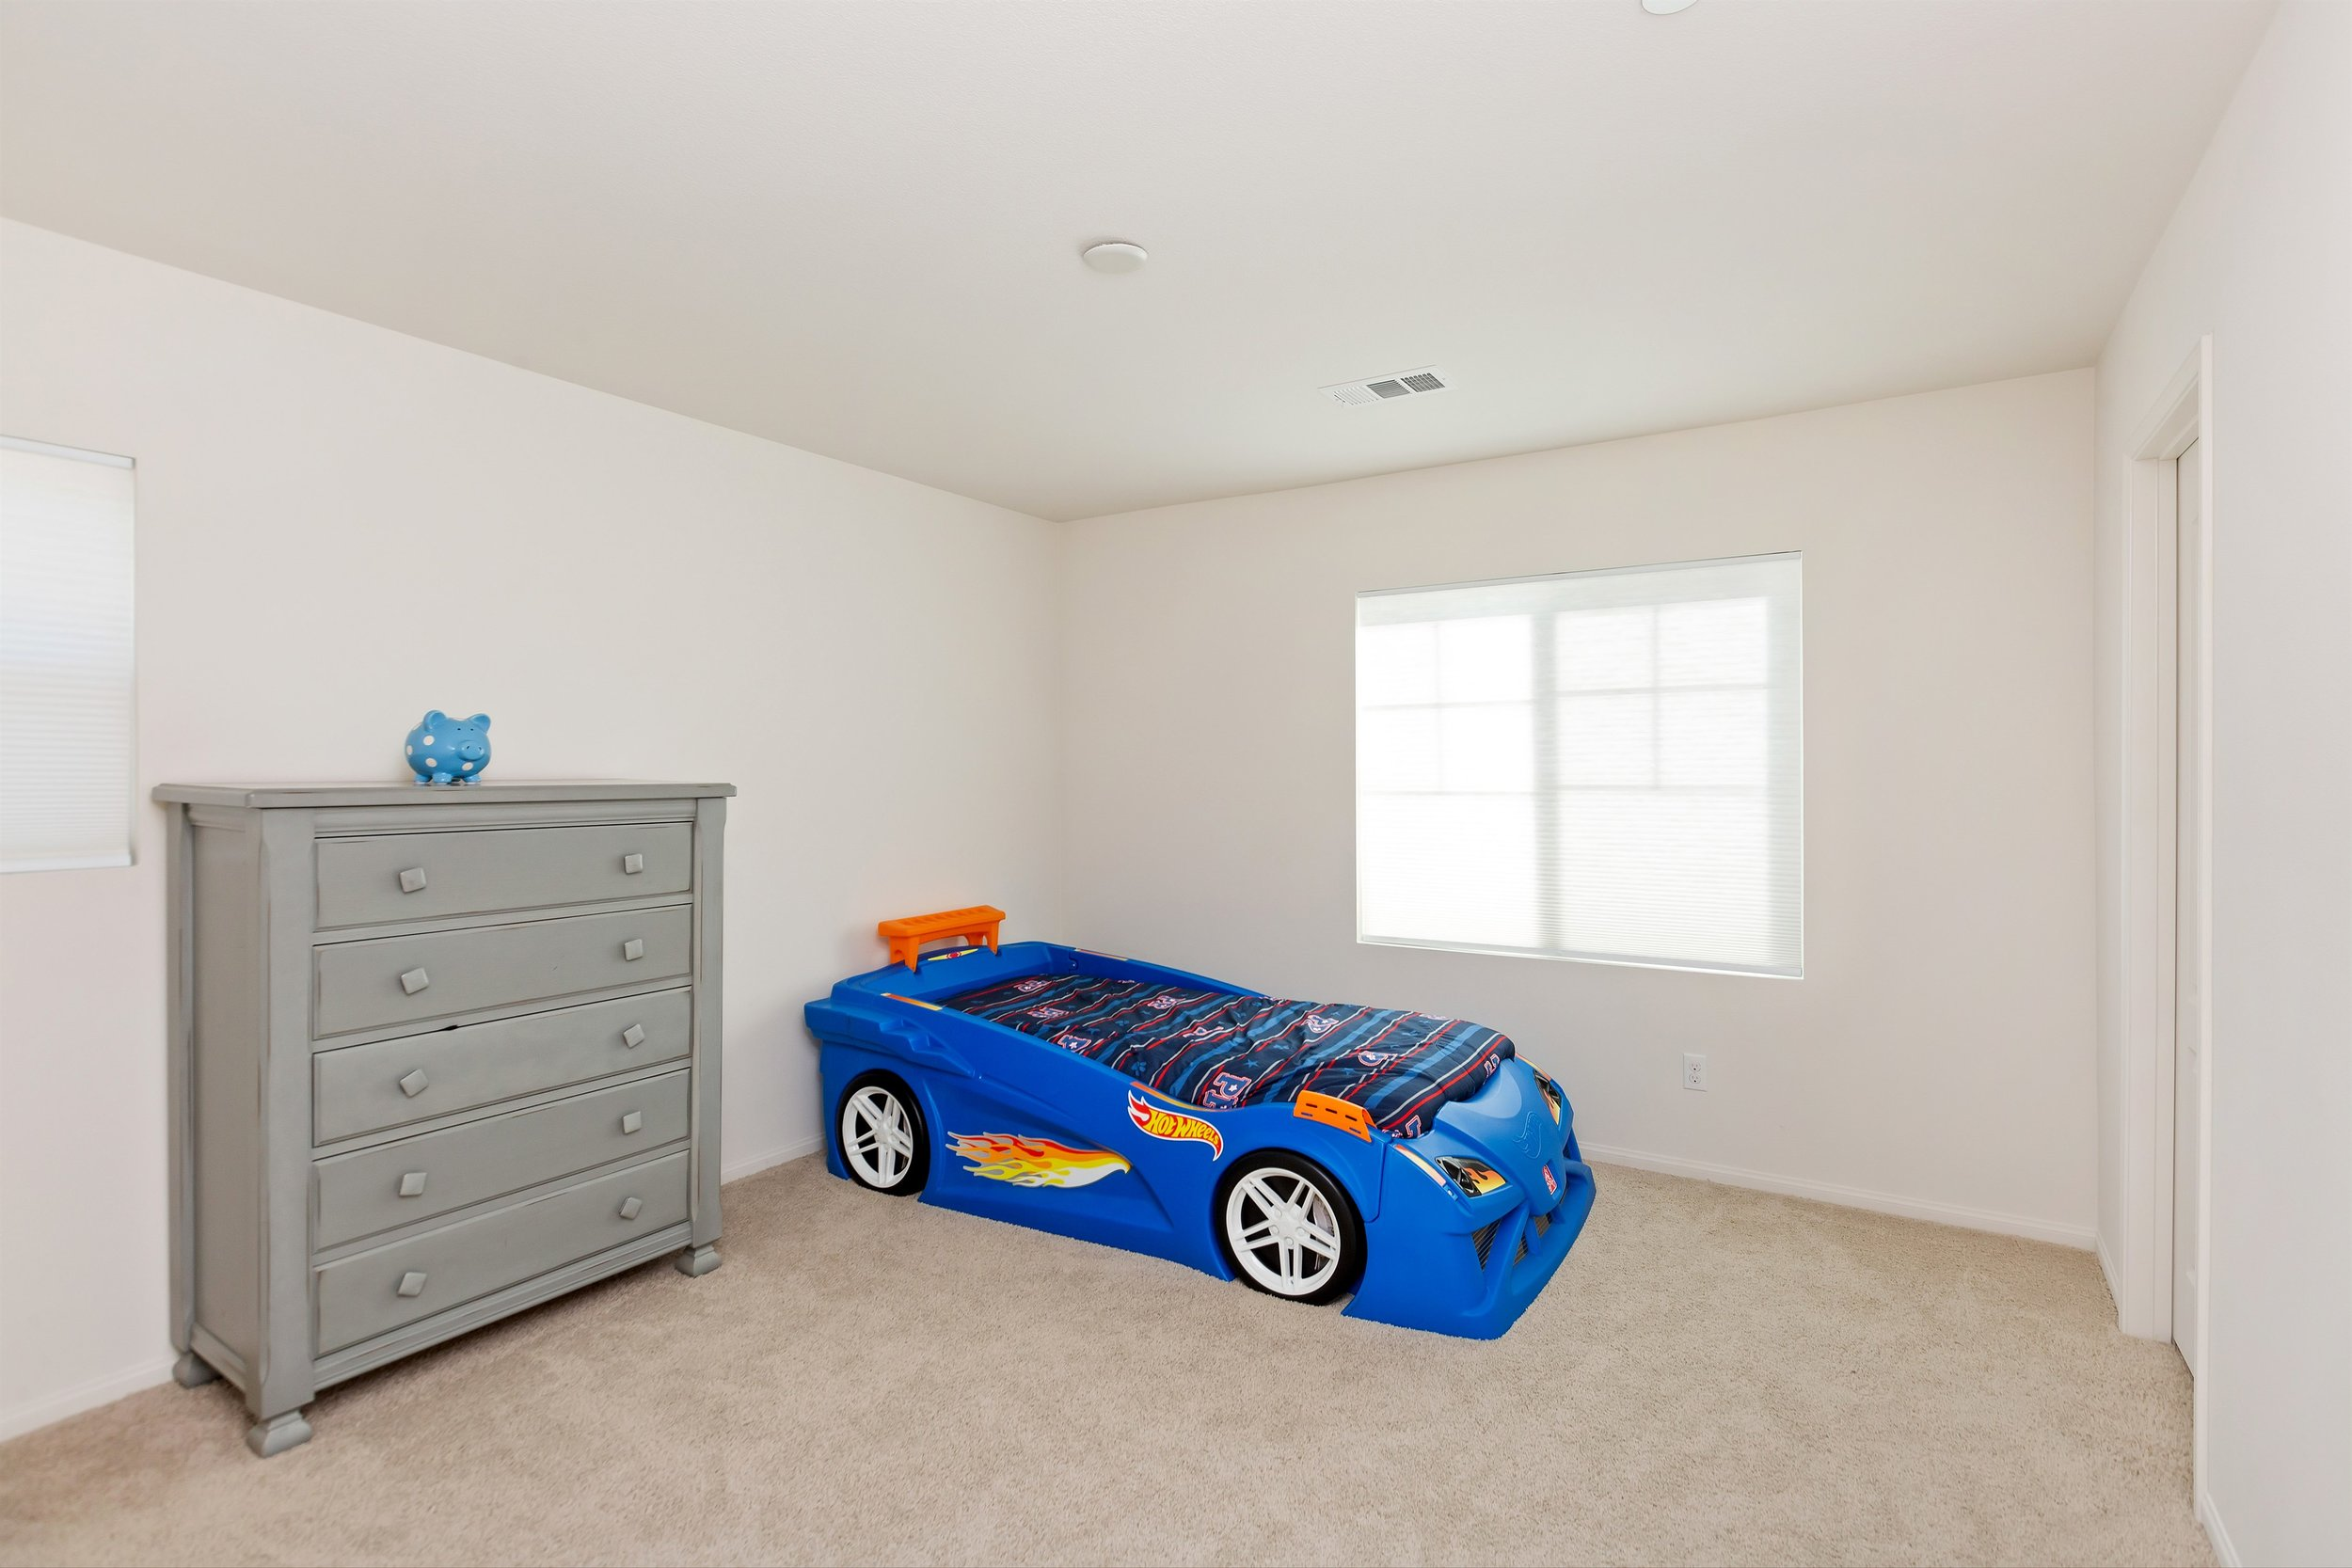 025_Bedroom.jpg